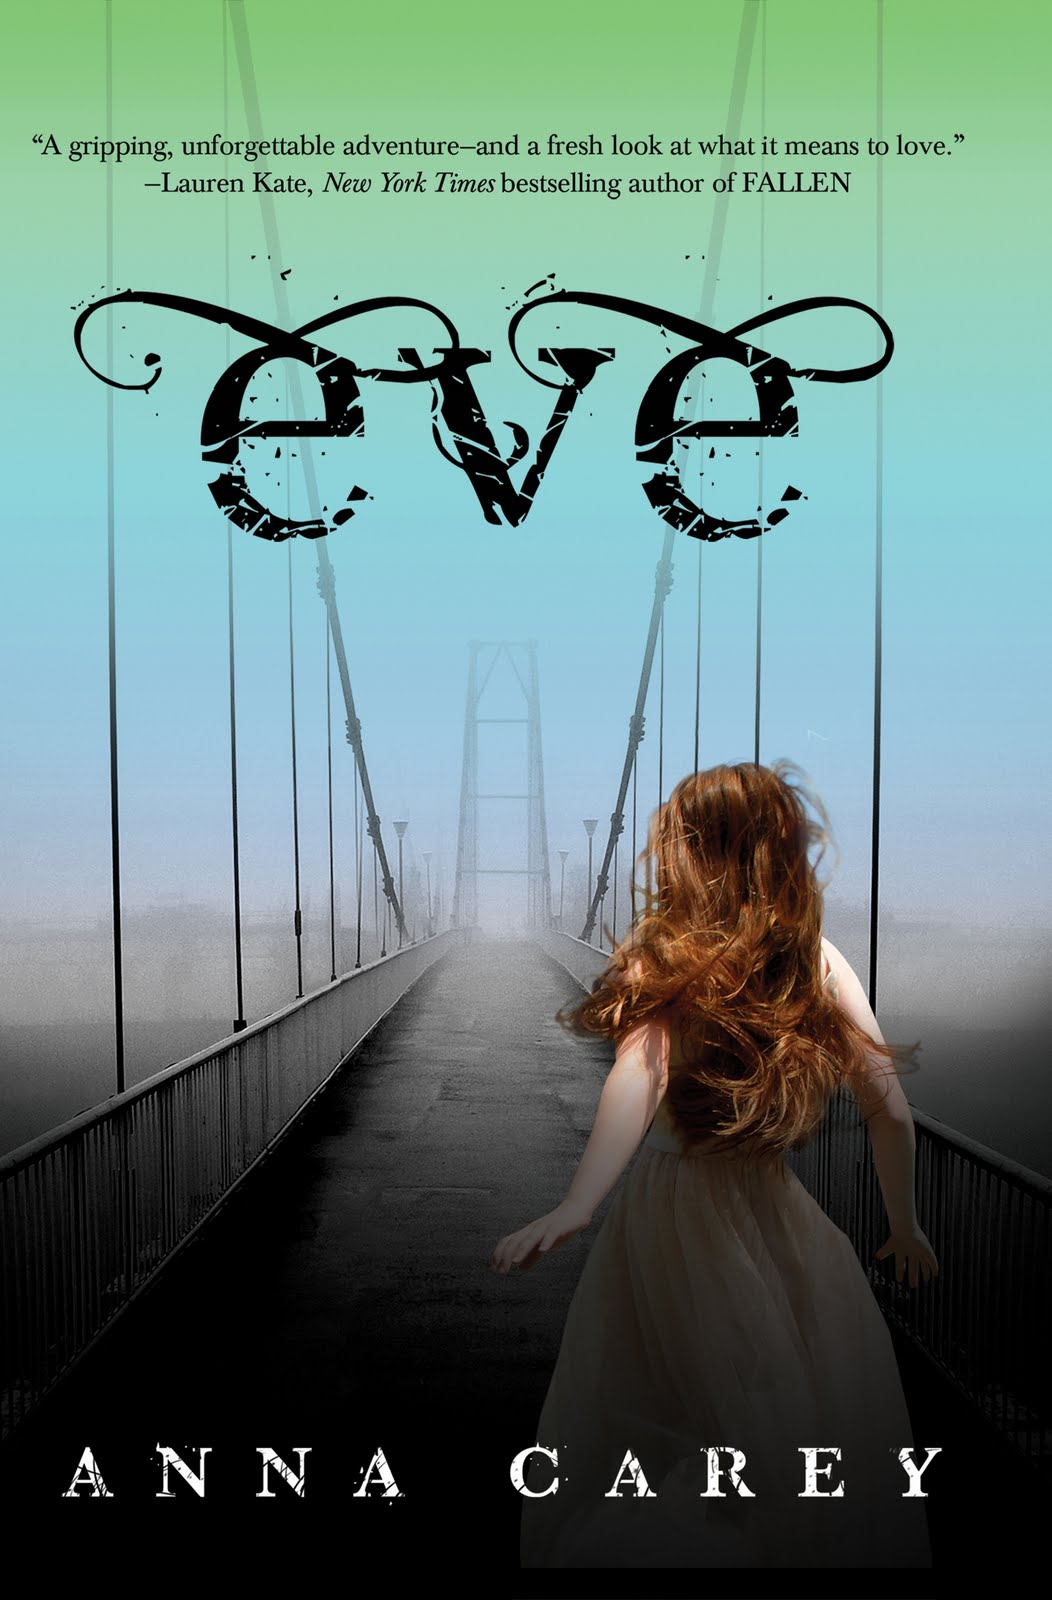 http://4.bp.blogspot.com/-31s8yu74DiA/T7qtuZfgalI/AAAAAAAADLk/ZG_eh4IMPug/s1600/portada-libro-Eve-de-Anna-Carey-cover-book-eve-by-anna-carey.jpg